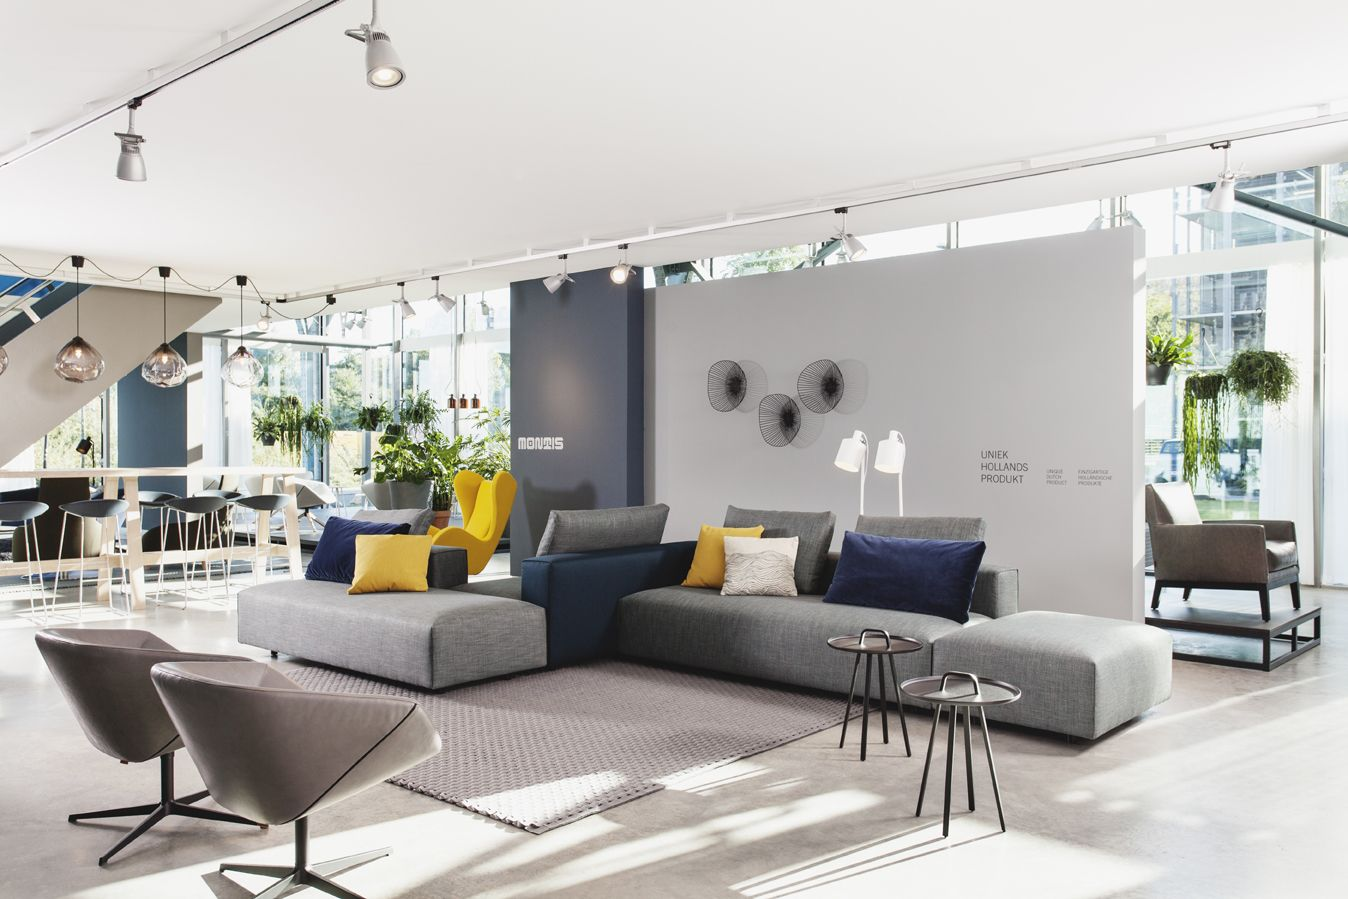 Domino dick spierenburg cool chairs silo series yangon modern design showroom